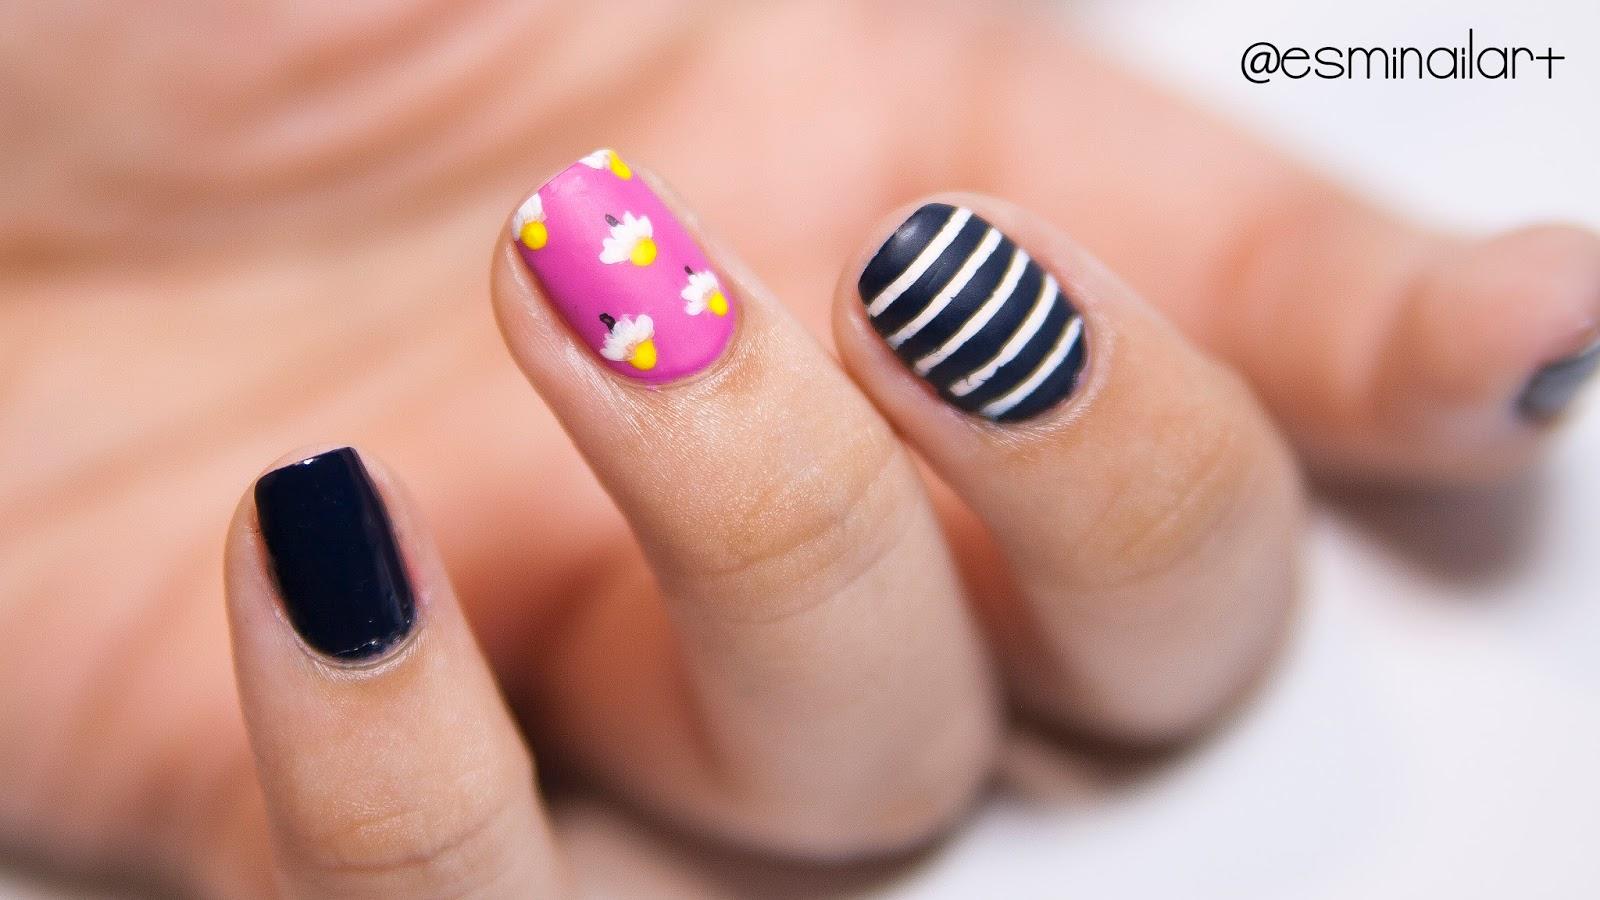 Mi nail art!: Nail art de margaritas | Maniswap + Vídeo tutorial